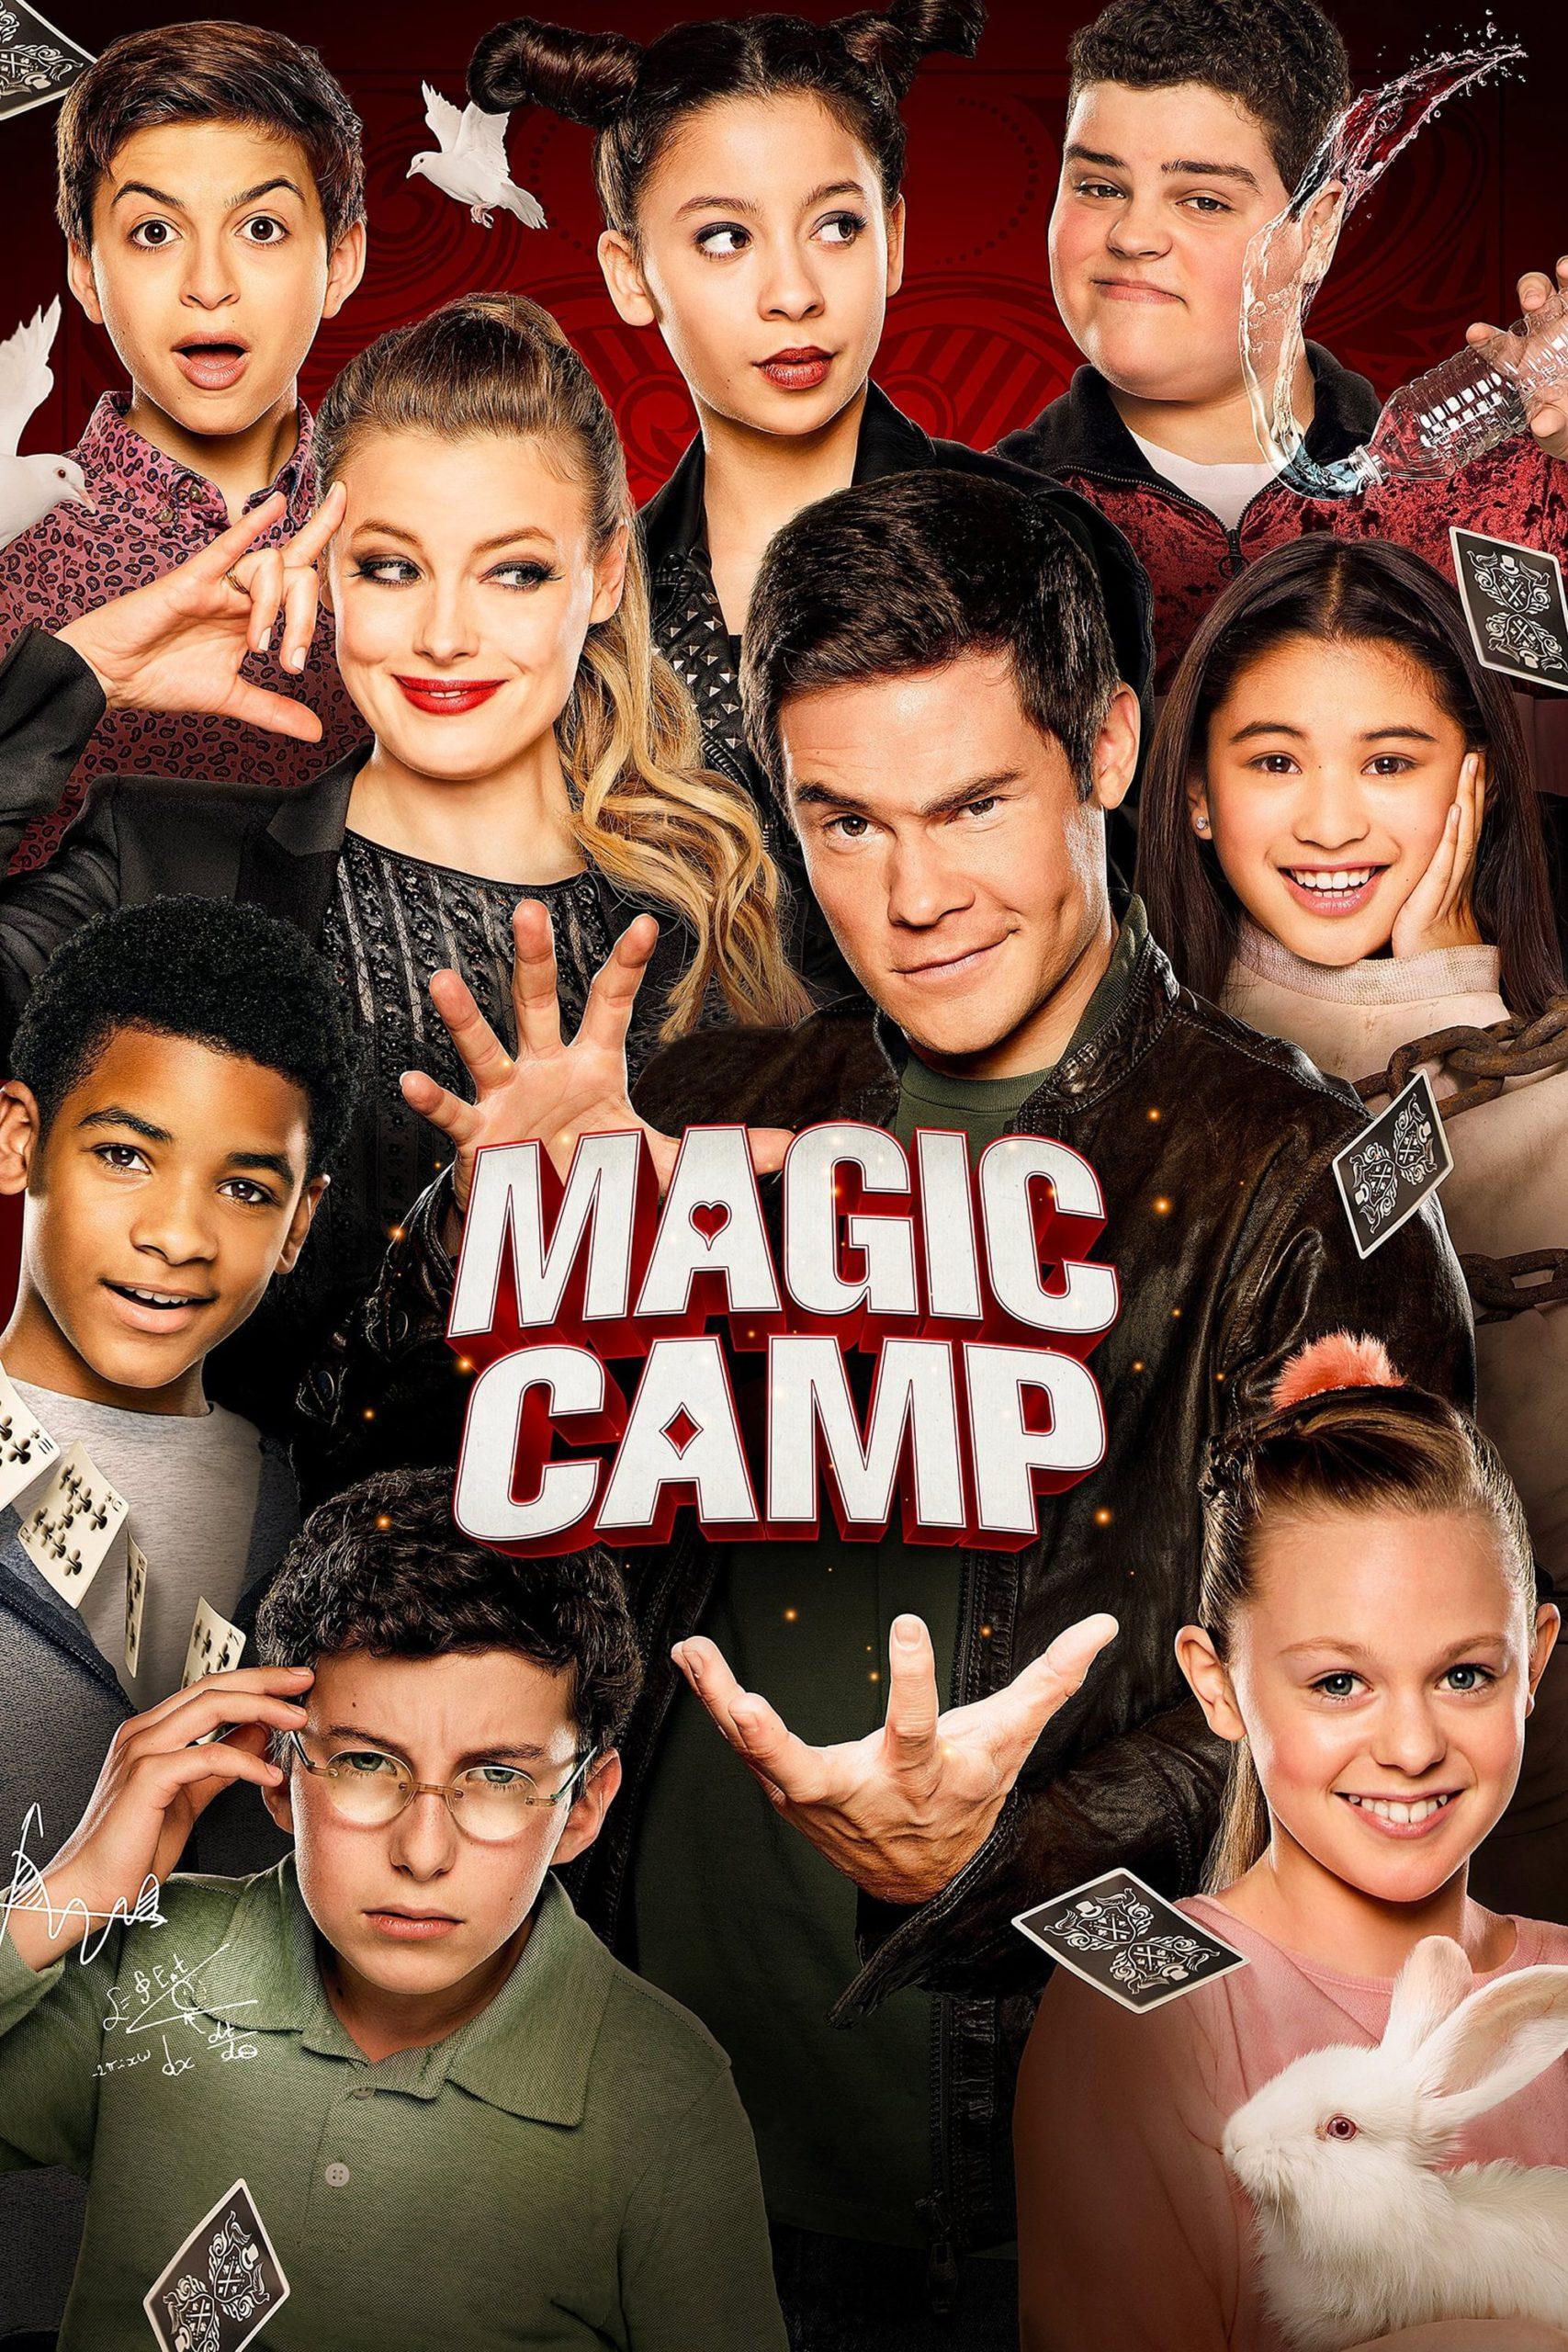 Regarder Magic Camp en streaming gratuit